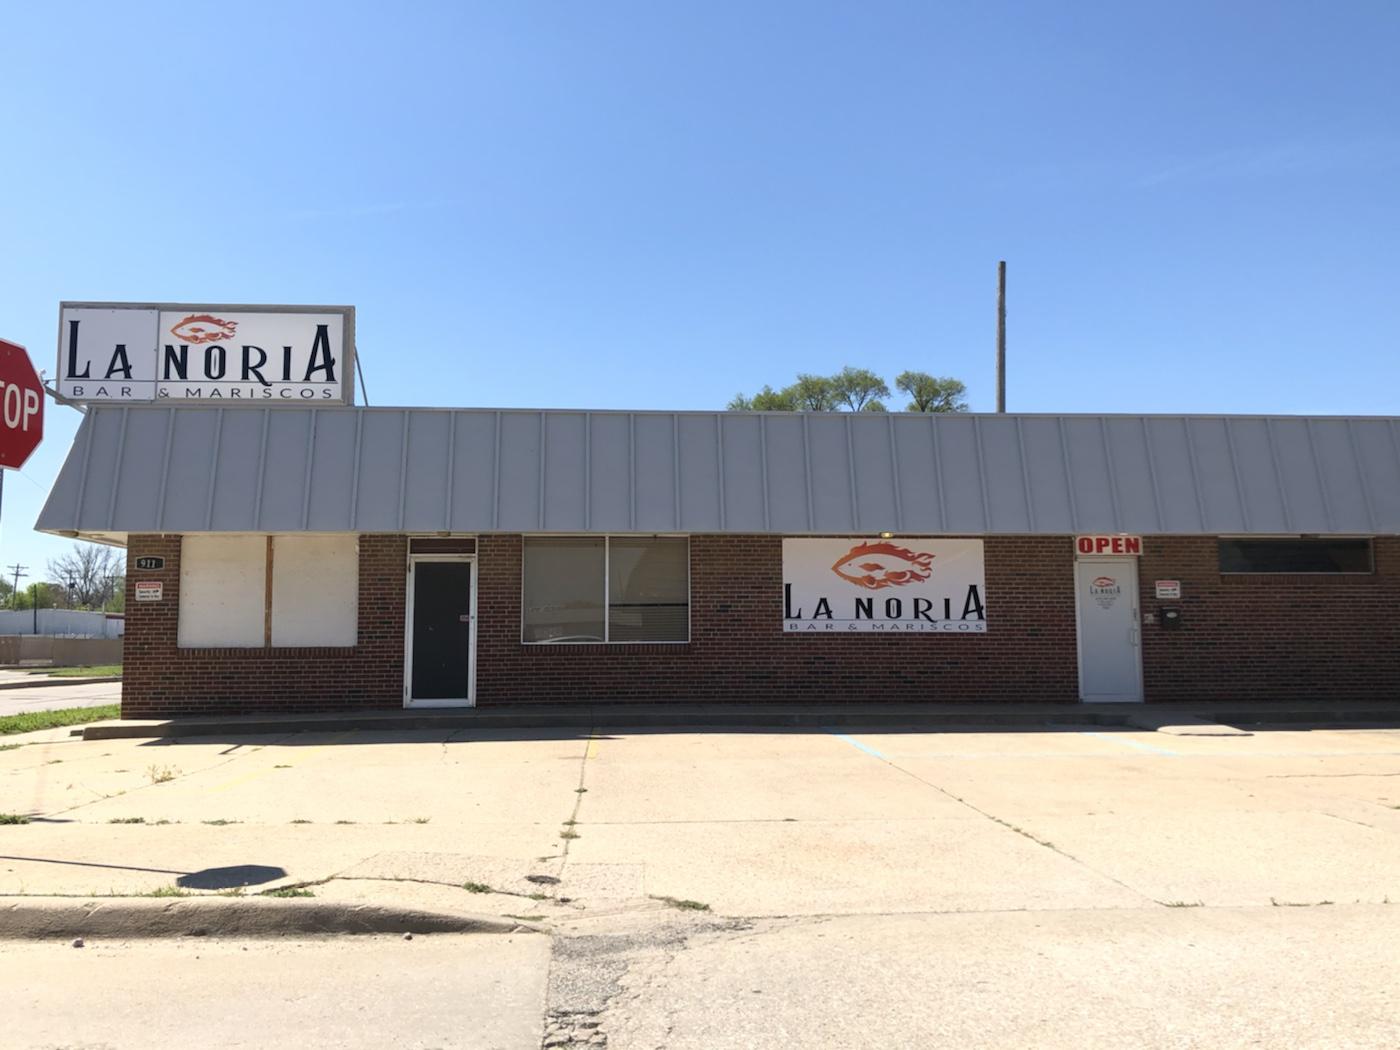 La Noria Bar & Mariscos